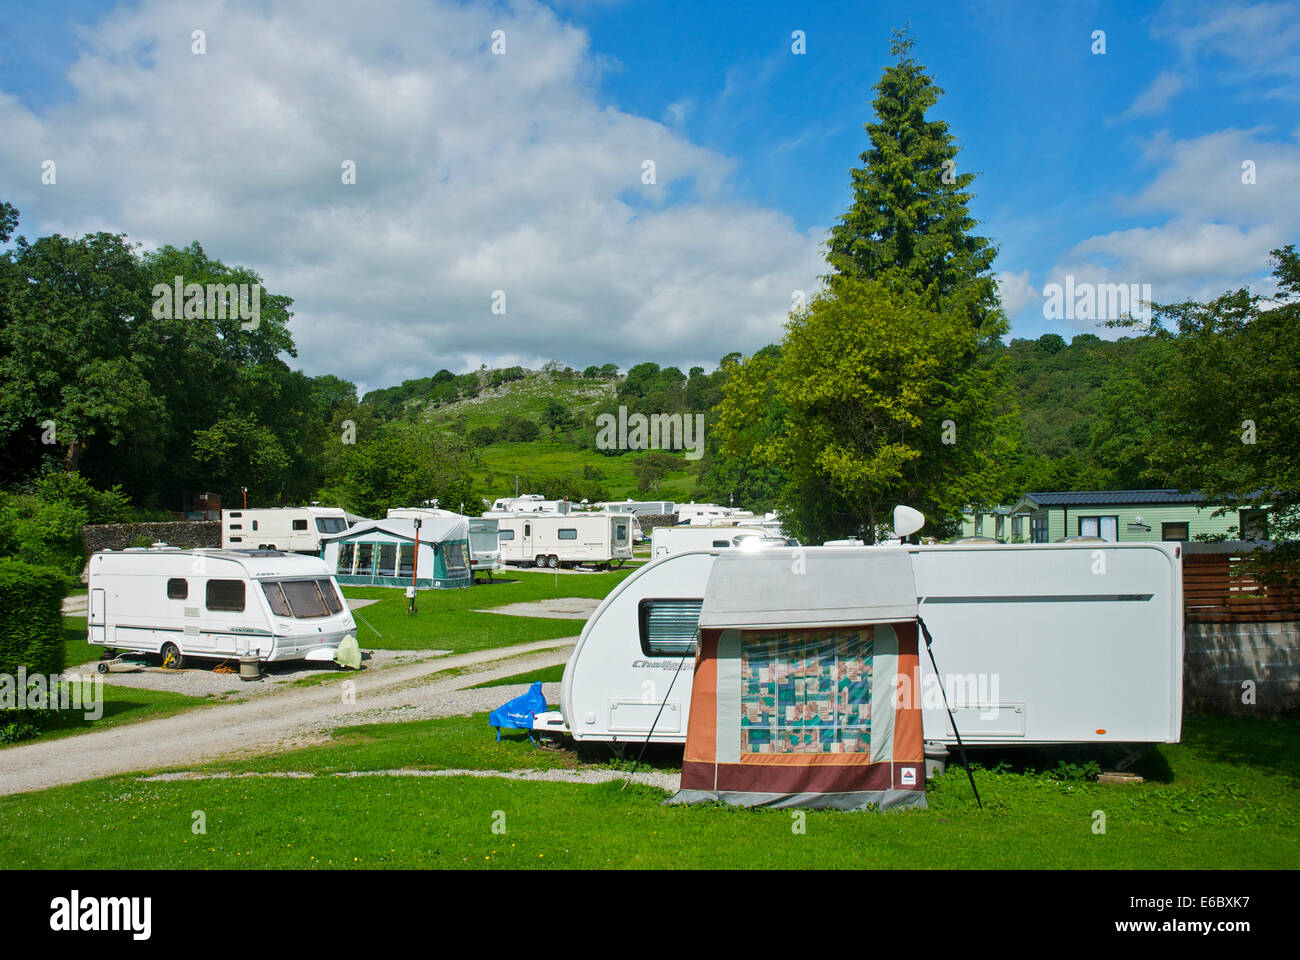 Legno Nook caravan park e campeggio, Skirethorns, vicino Grassington, Wharfedale, Yorkshire Dales Parco Nat, England Immagini Stock